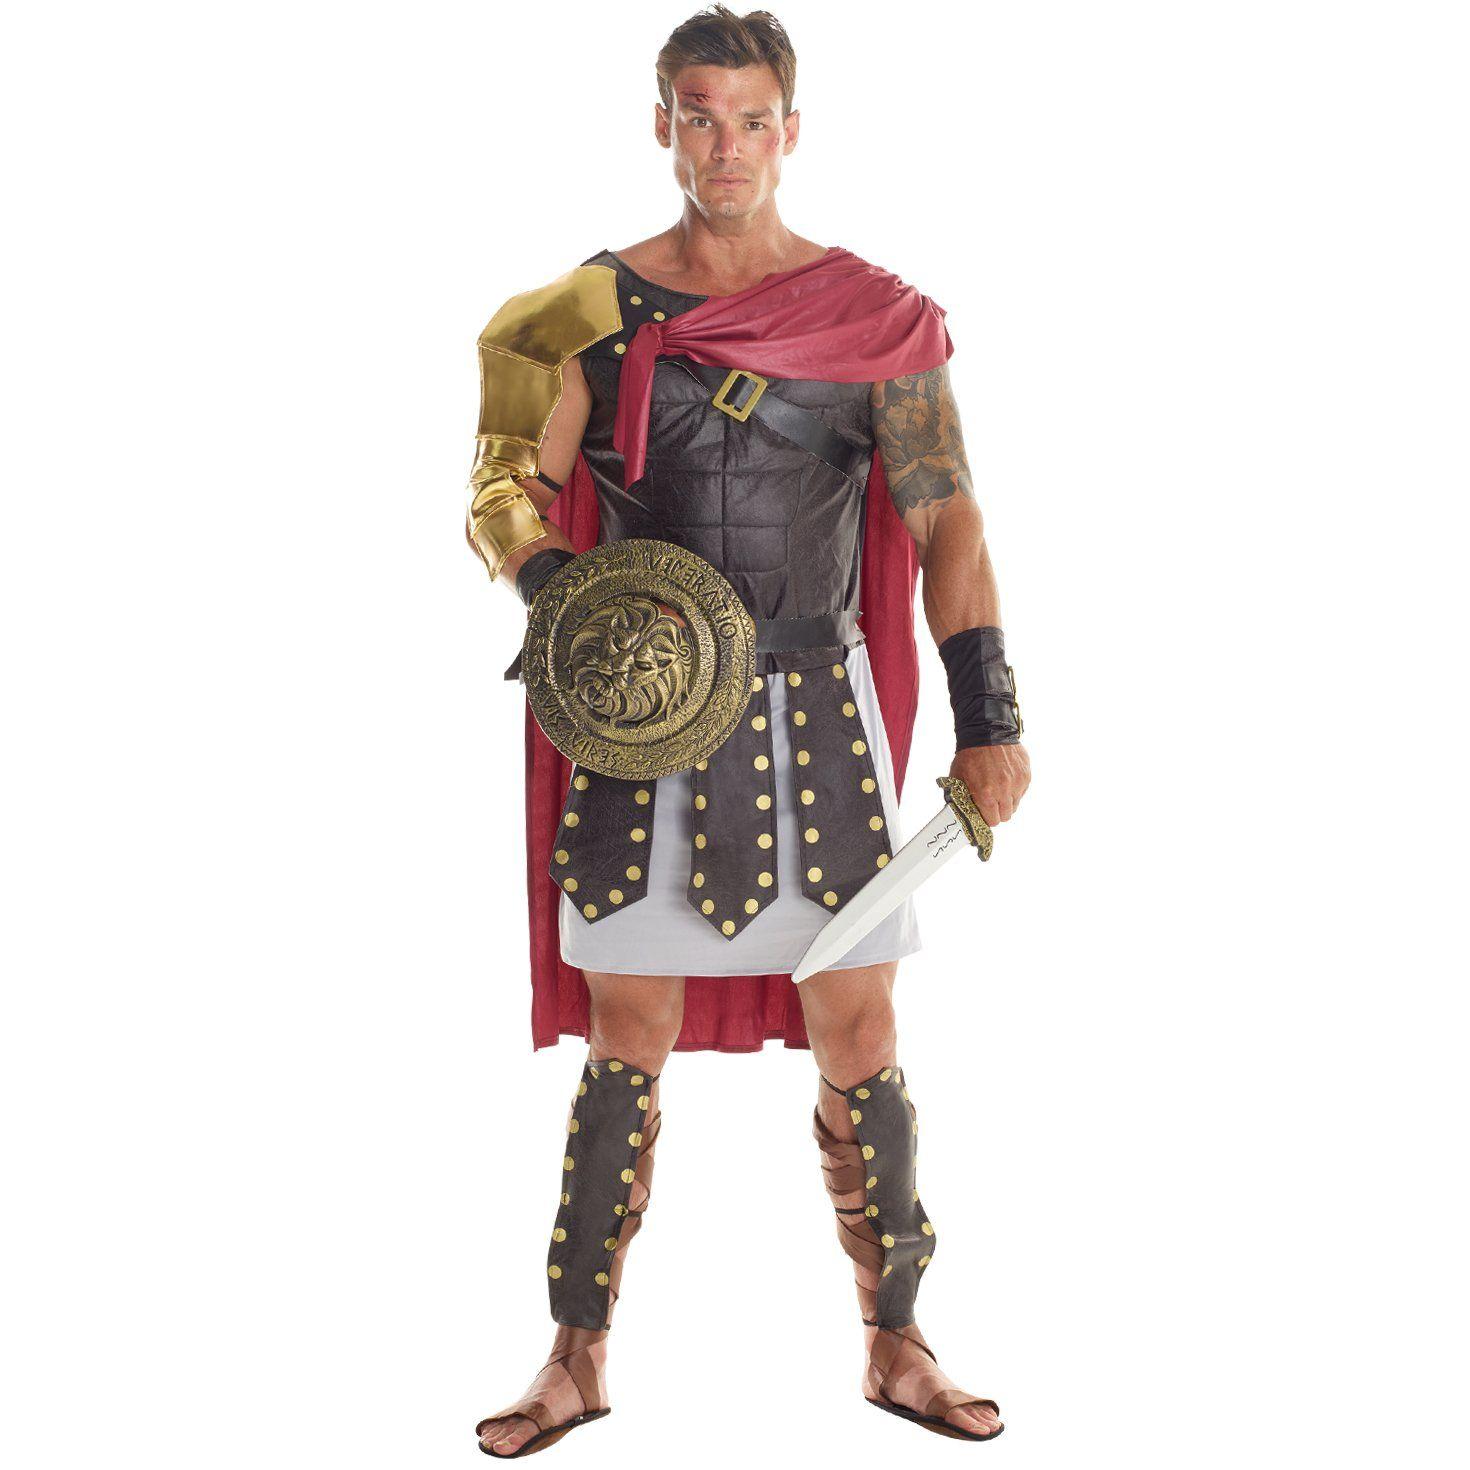 Rubies Costume Mens Roman Apron and Belt Accessory